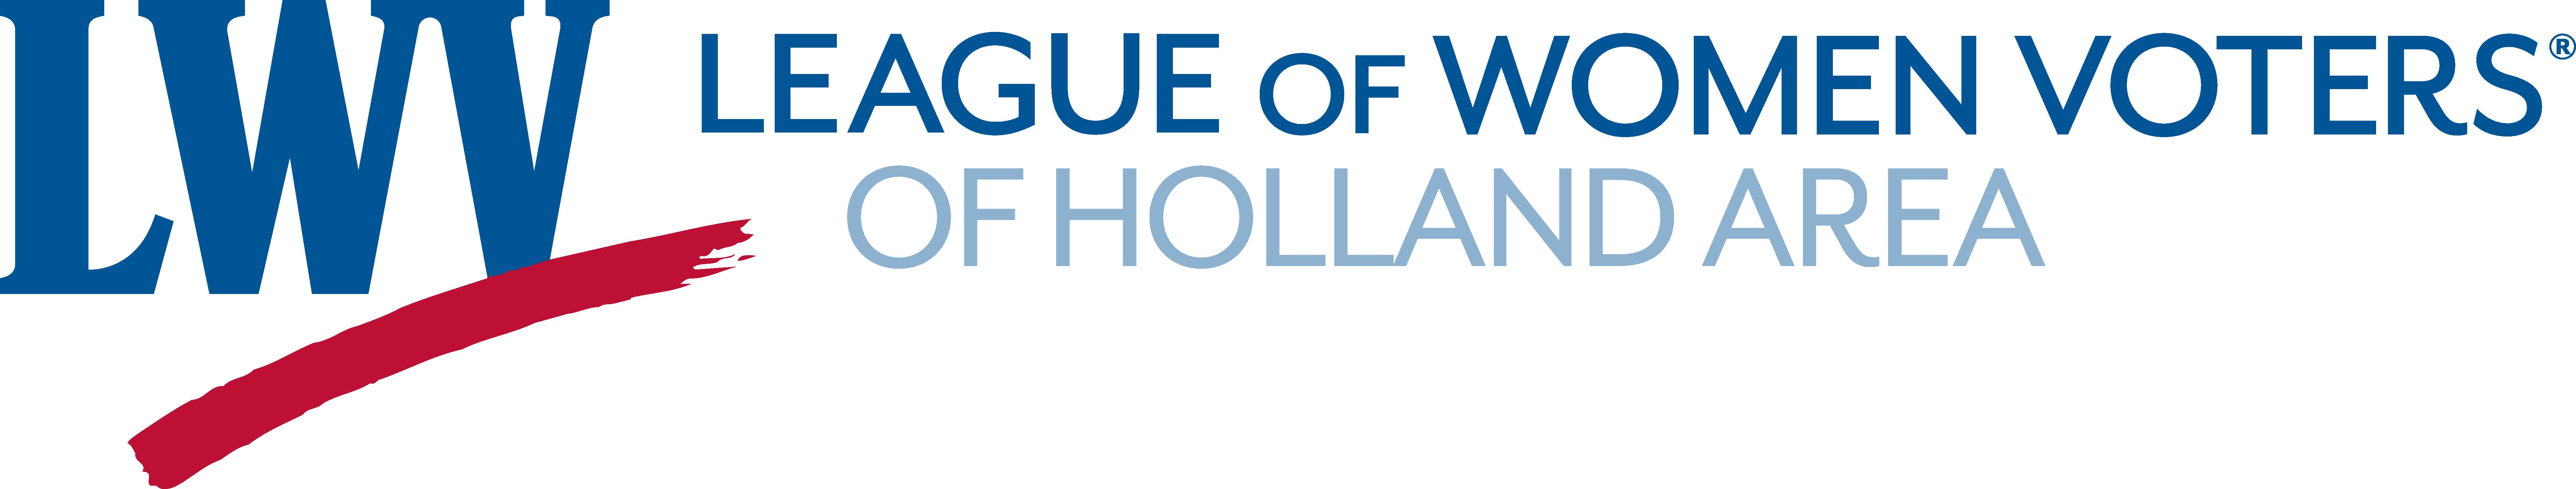 Holland logo